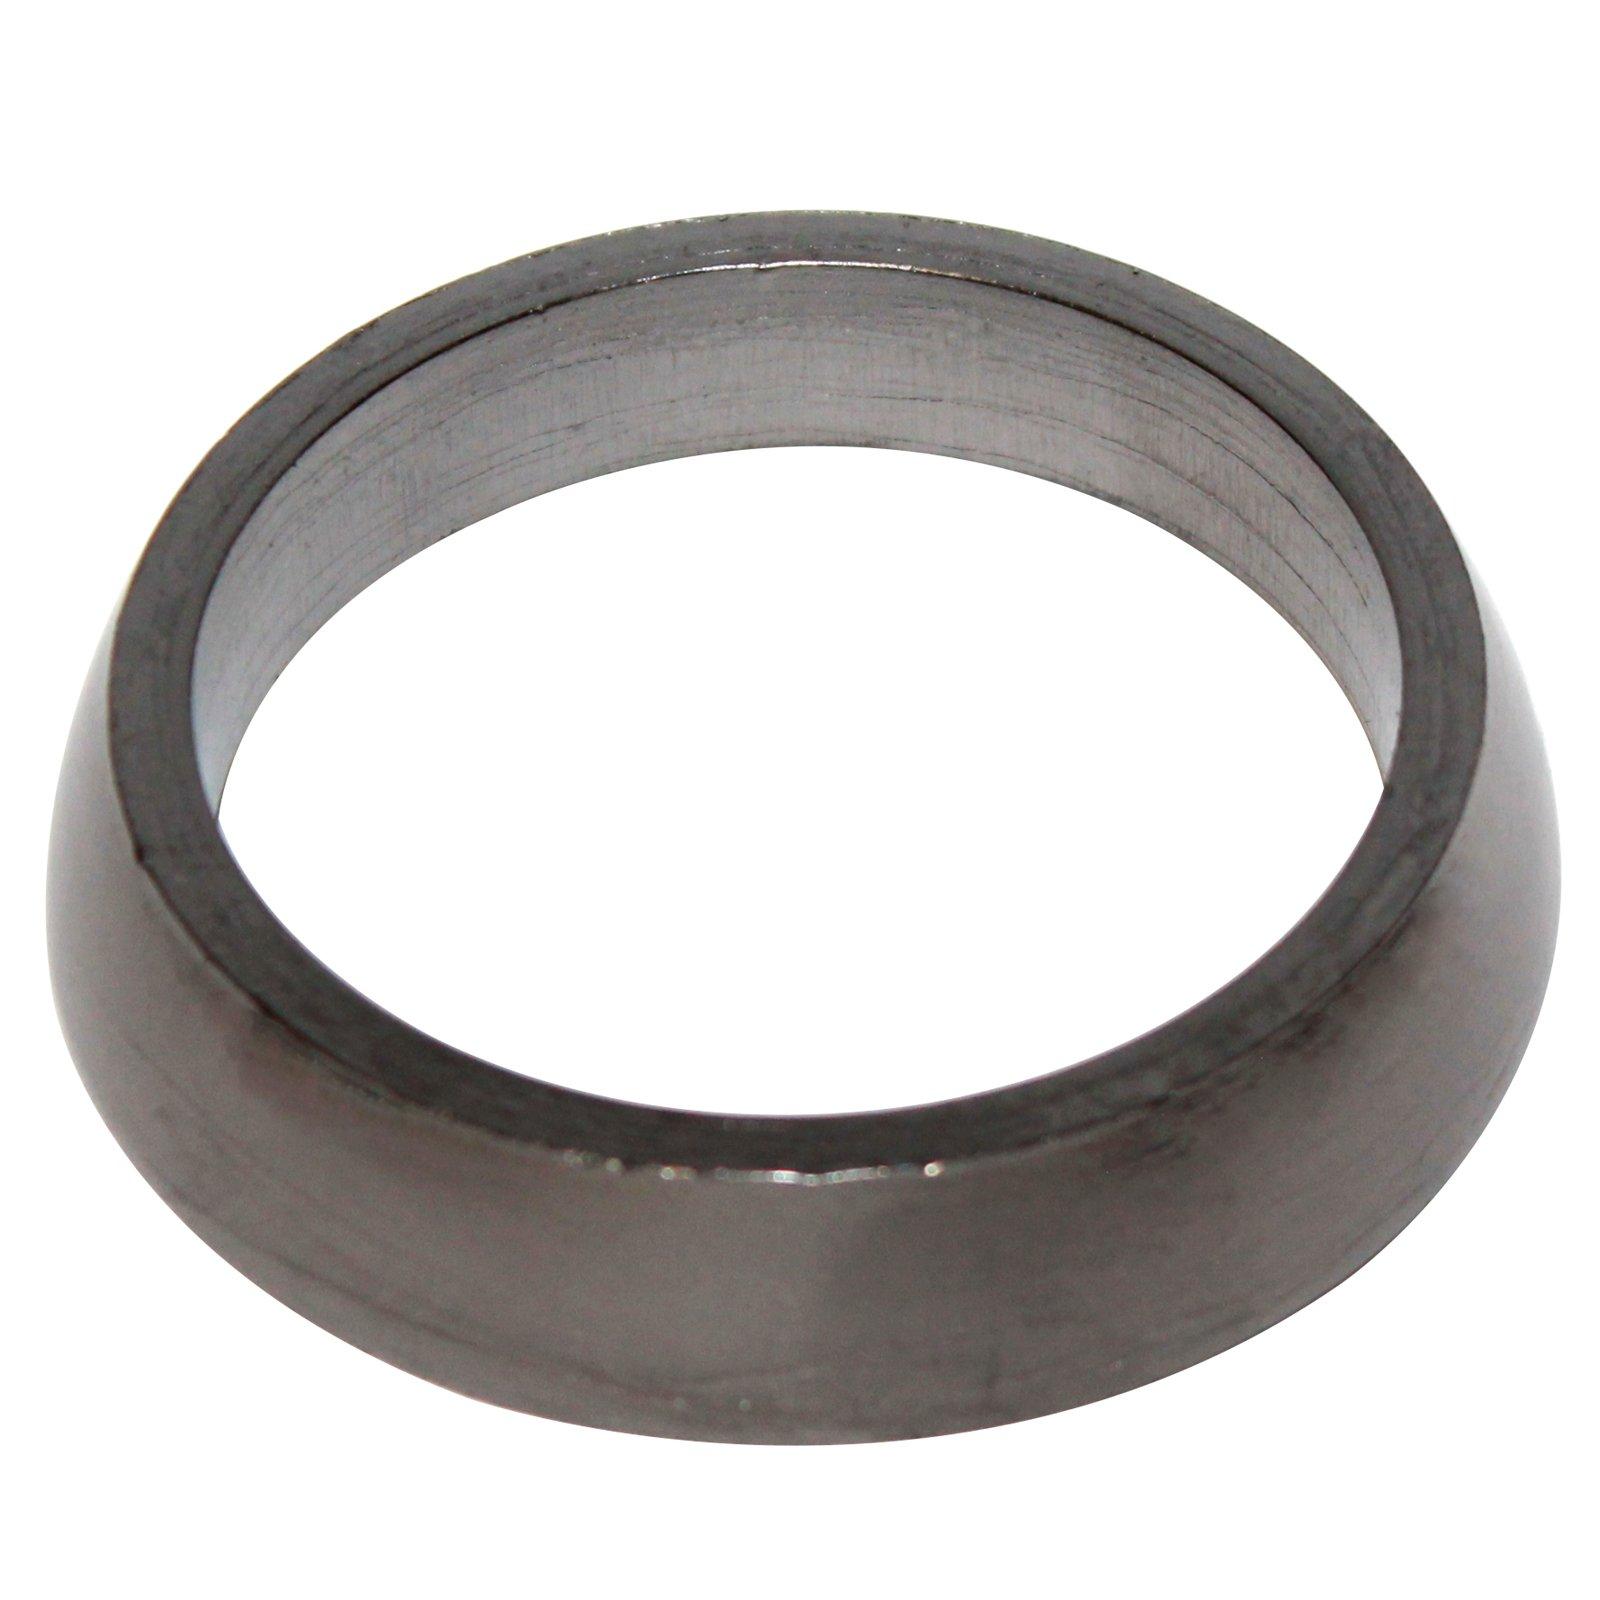 CALTRIC Exhaust Gasket Donut Seal Fits POLARIS SPORT 400 400L 400-L 1996-1999